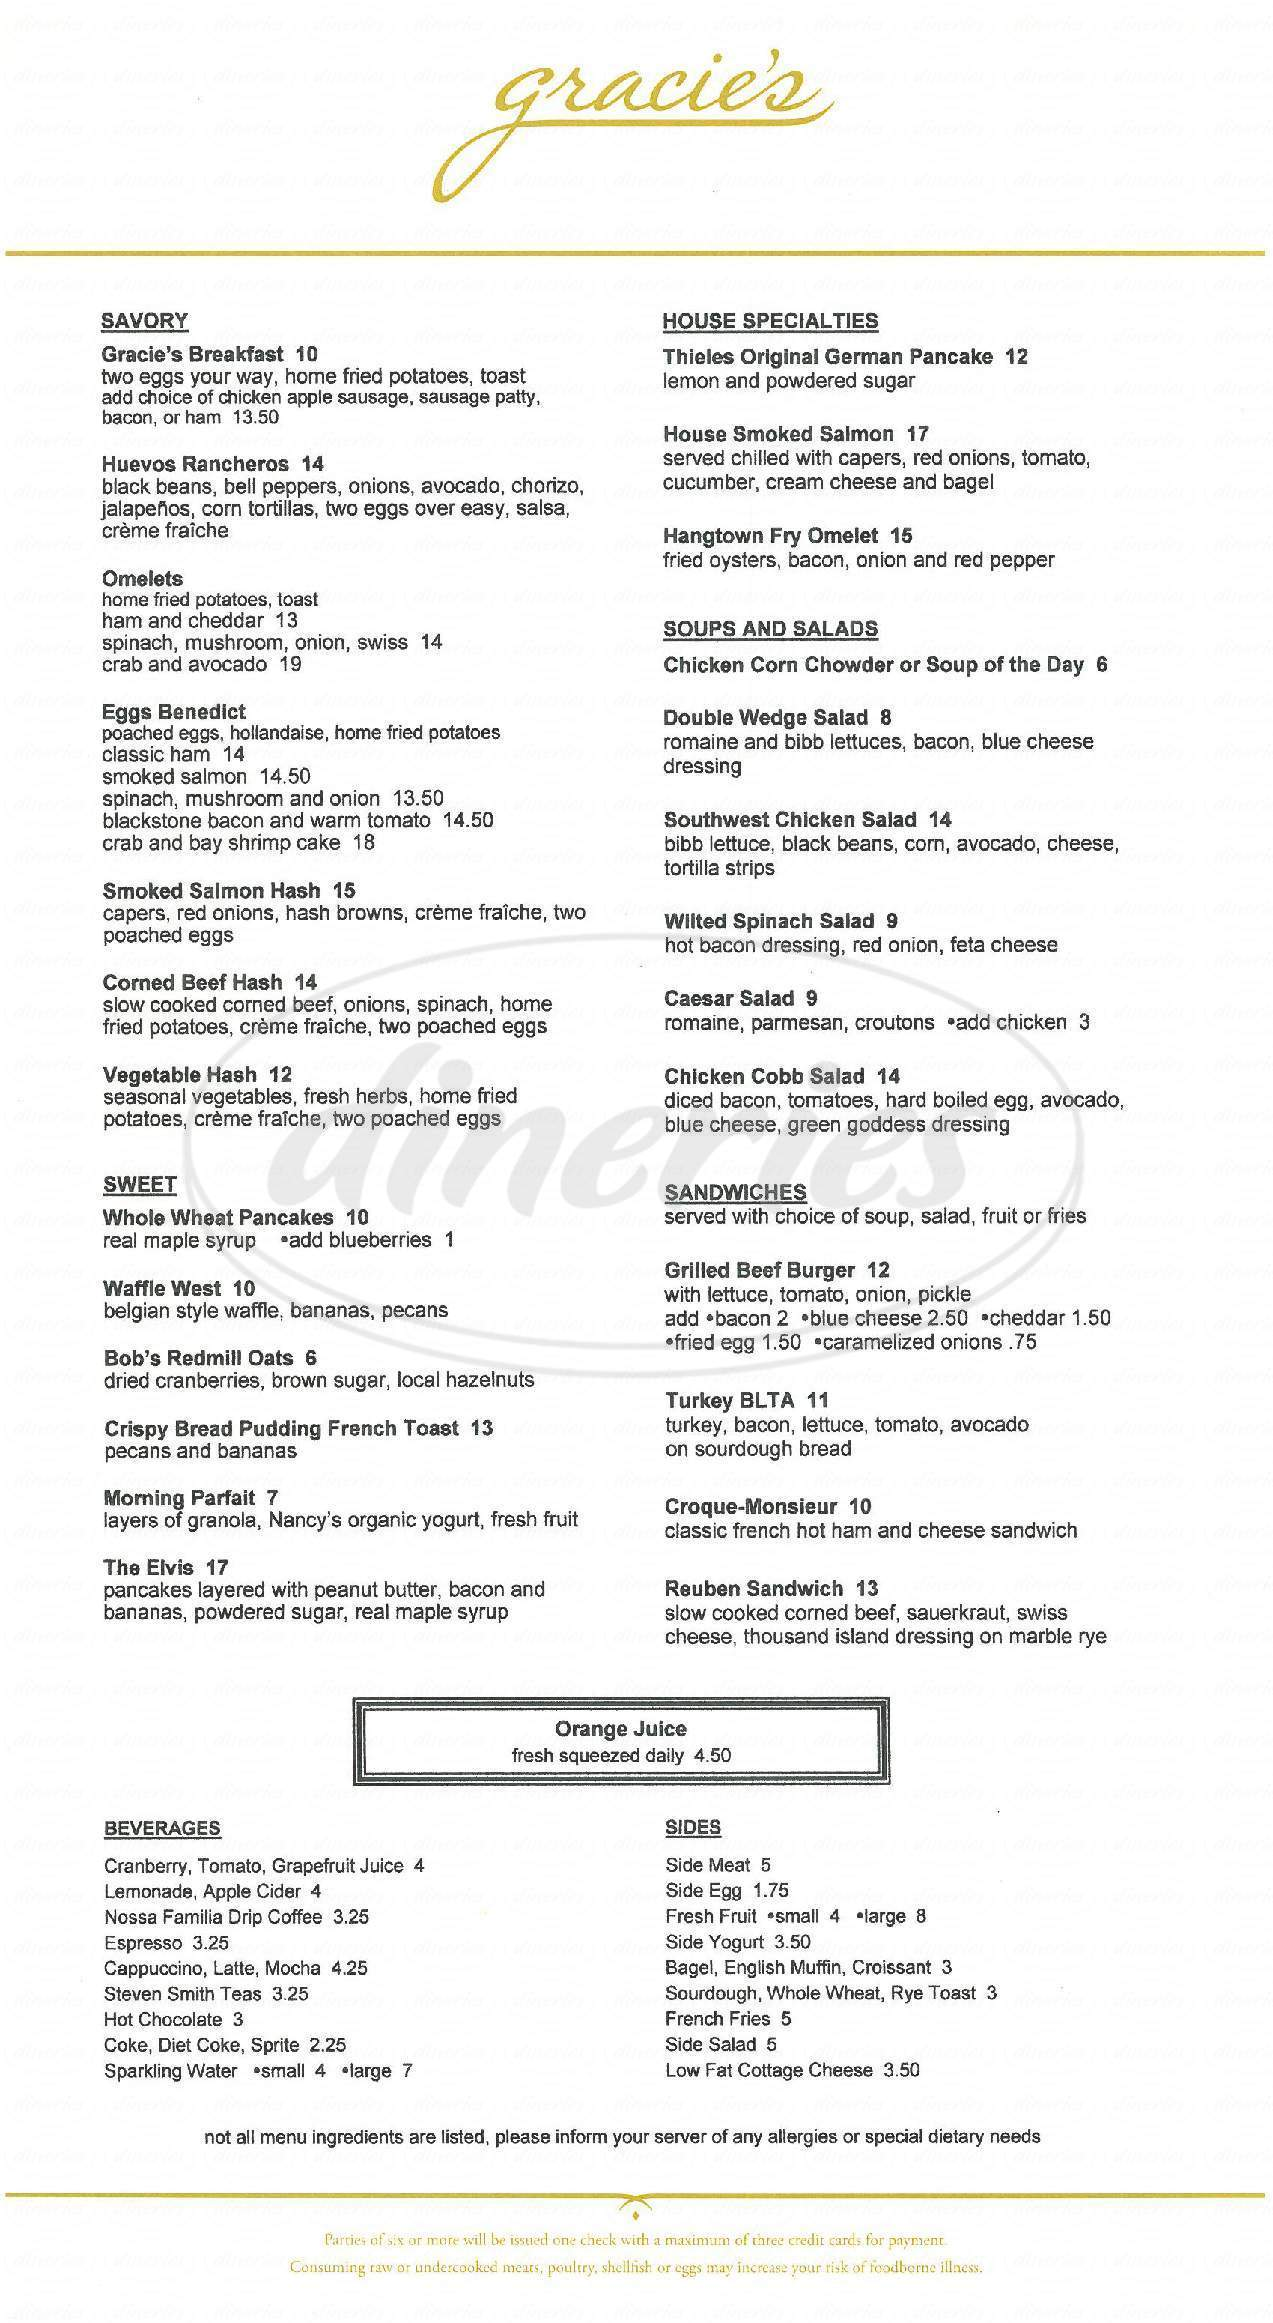 menu for Gracie's